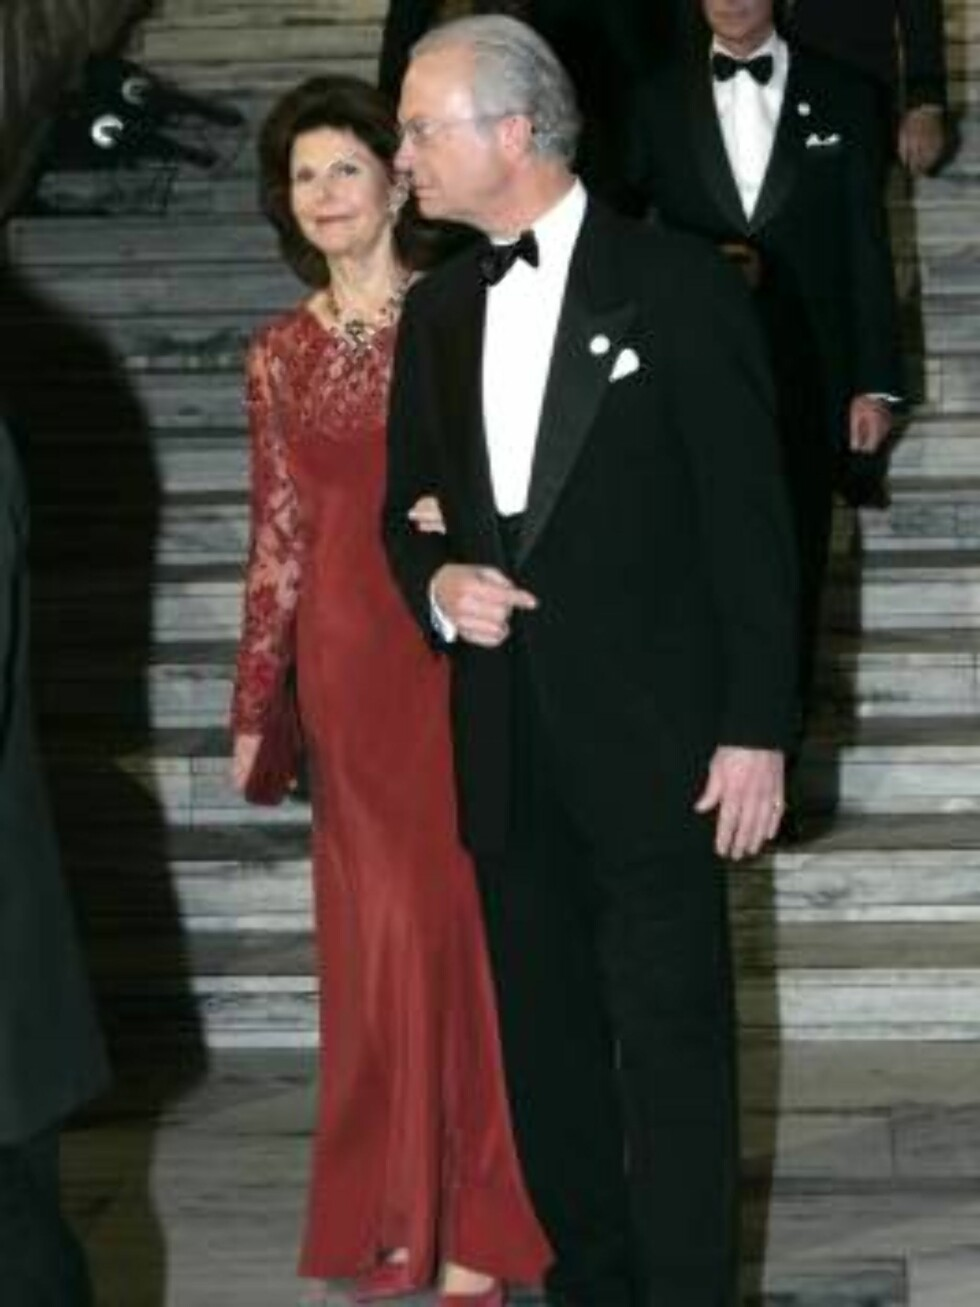 STAS: Dronning Silvia og kong Carl Gustaf Foto: SCANPIX